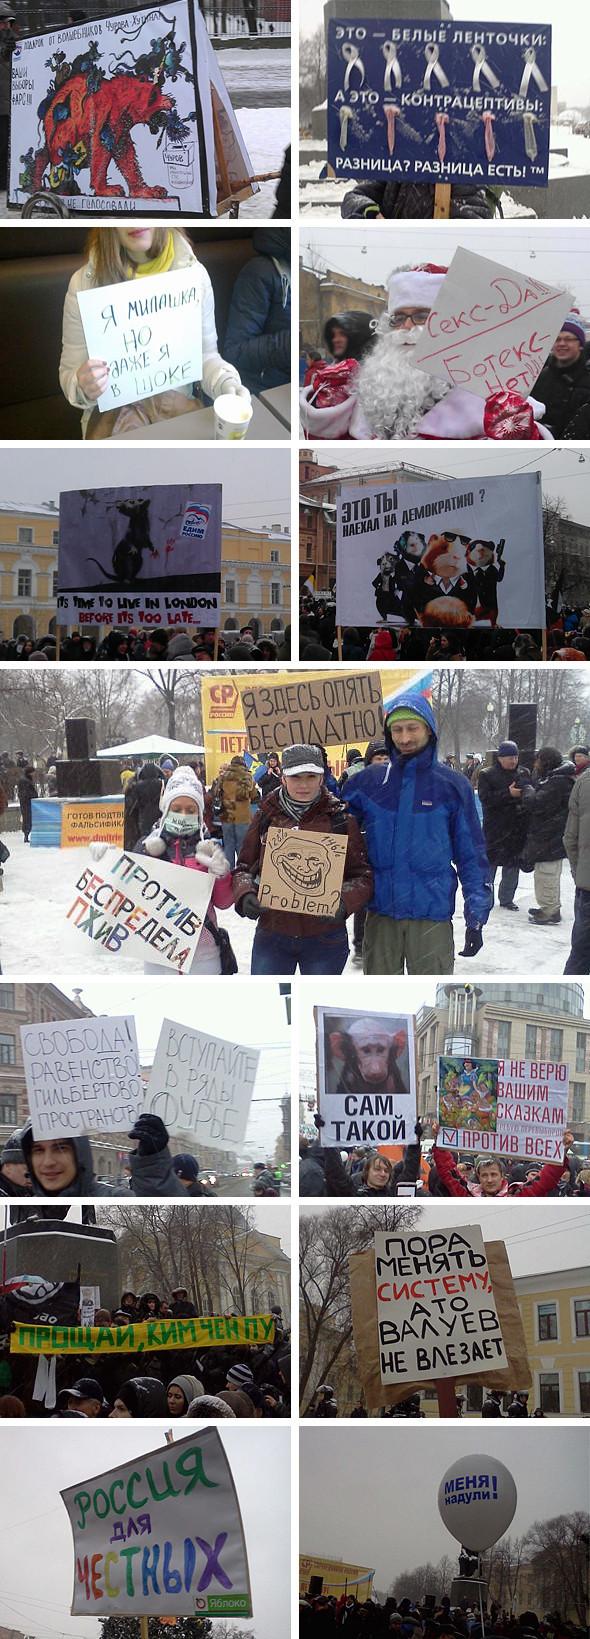 Фотографии: 1. Сергей Юркинский; 2. http://twitter.com/KFKnews; 3. http://twitpic.com/menshilo; 4, 5, 6. Сергей Юркинский; 7, 8, 9, 10, 11, 12, 13. http://twitter.com/KFKnews.. Изображение № 49.